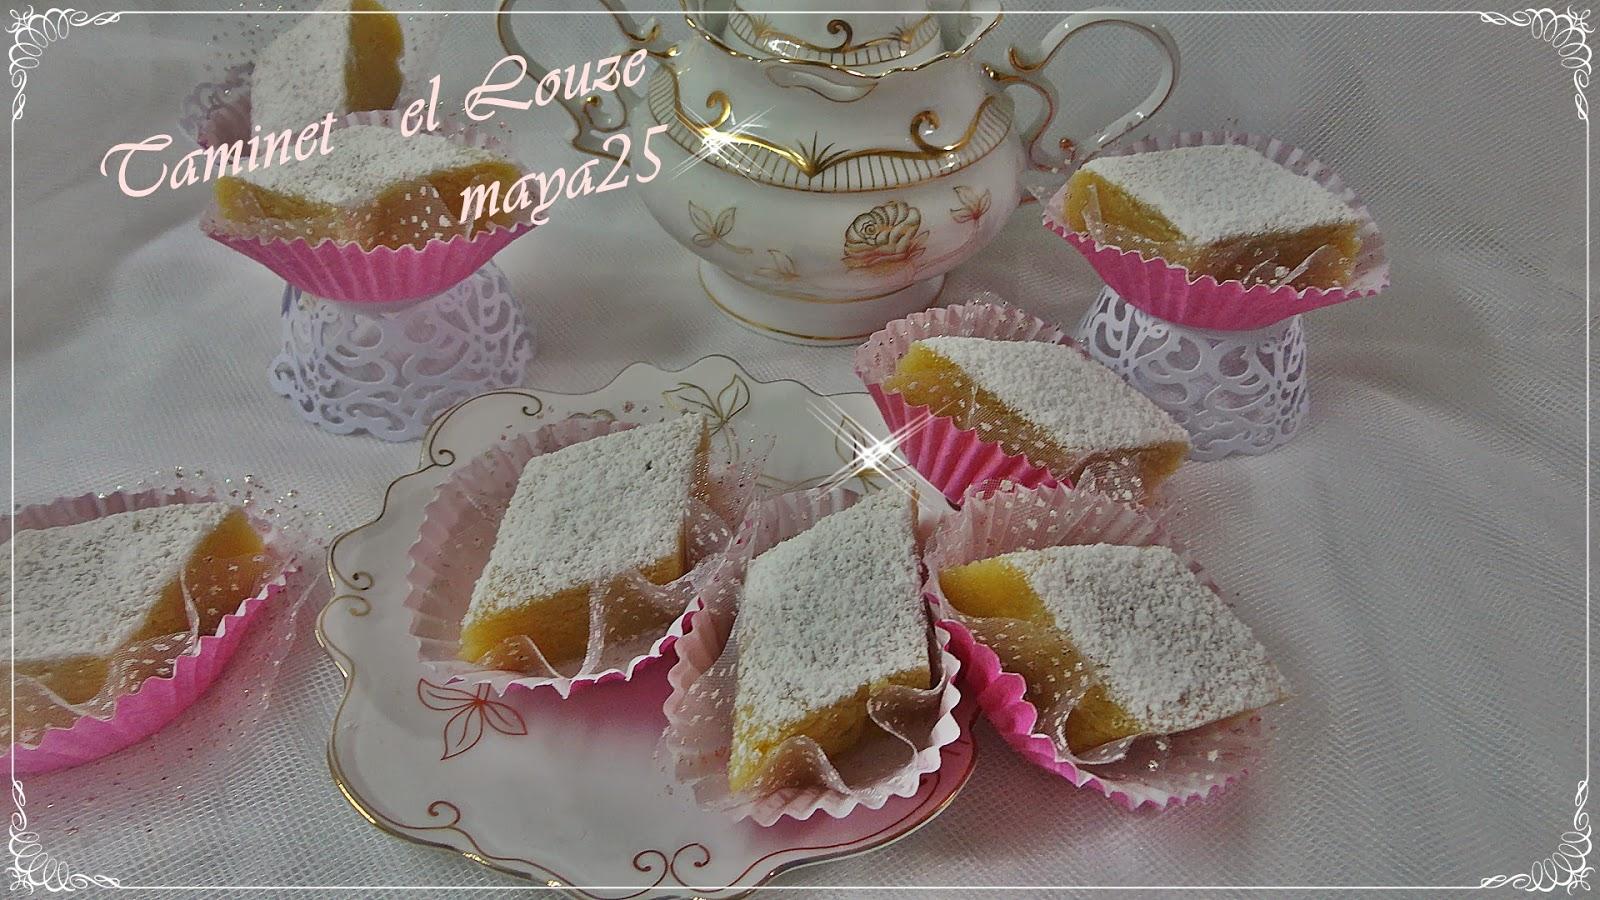 les recettes de taminet el louze p 226 te d amande constantinoise طمينة اللوز